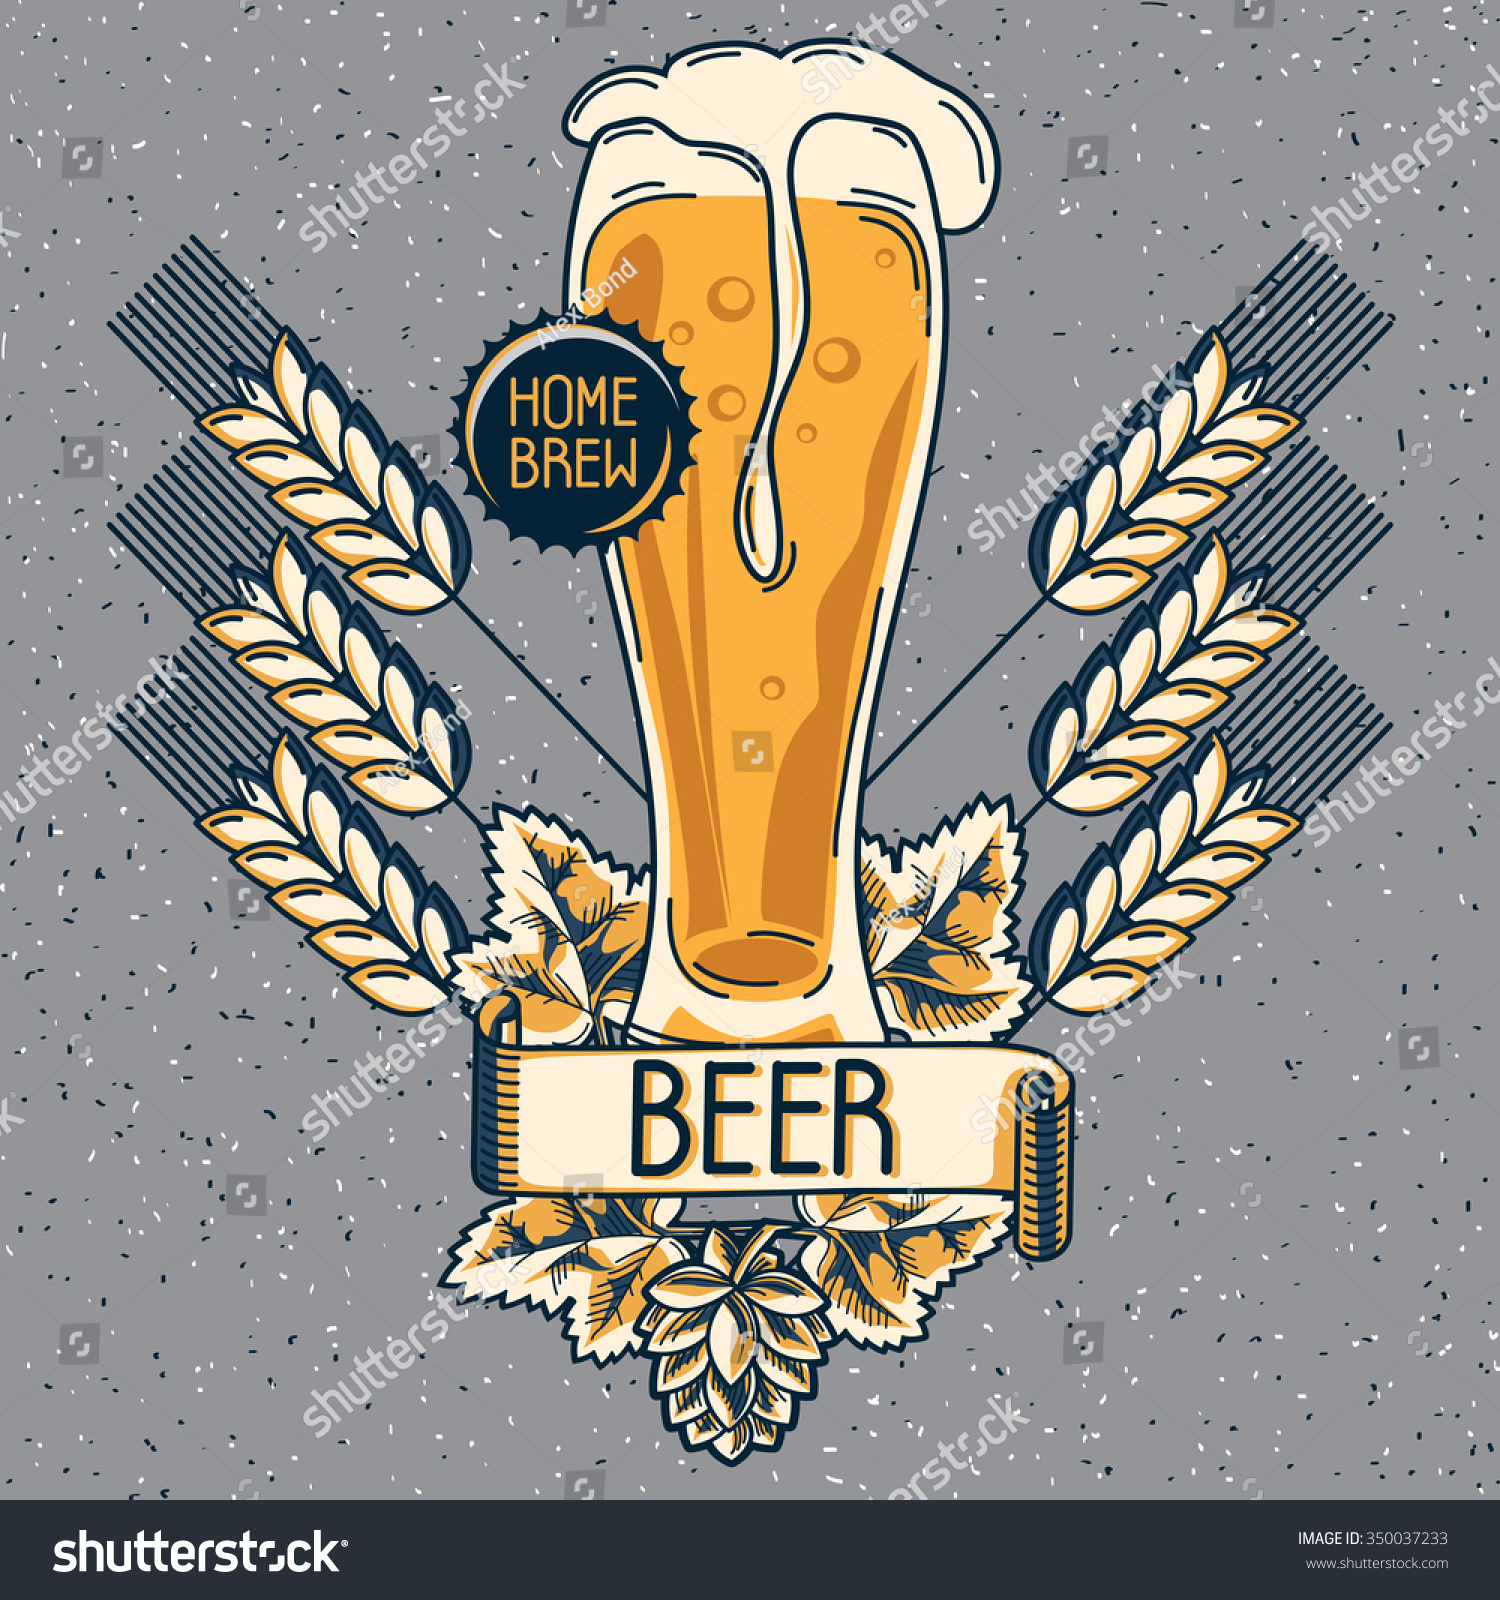 Home brew craft beer emblem stock vector illustration for Home brew craft beer